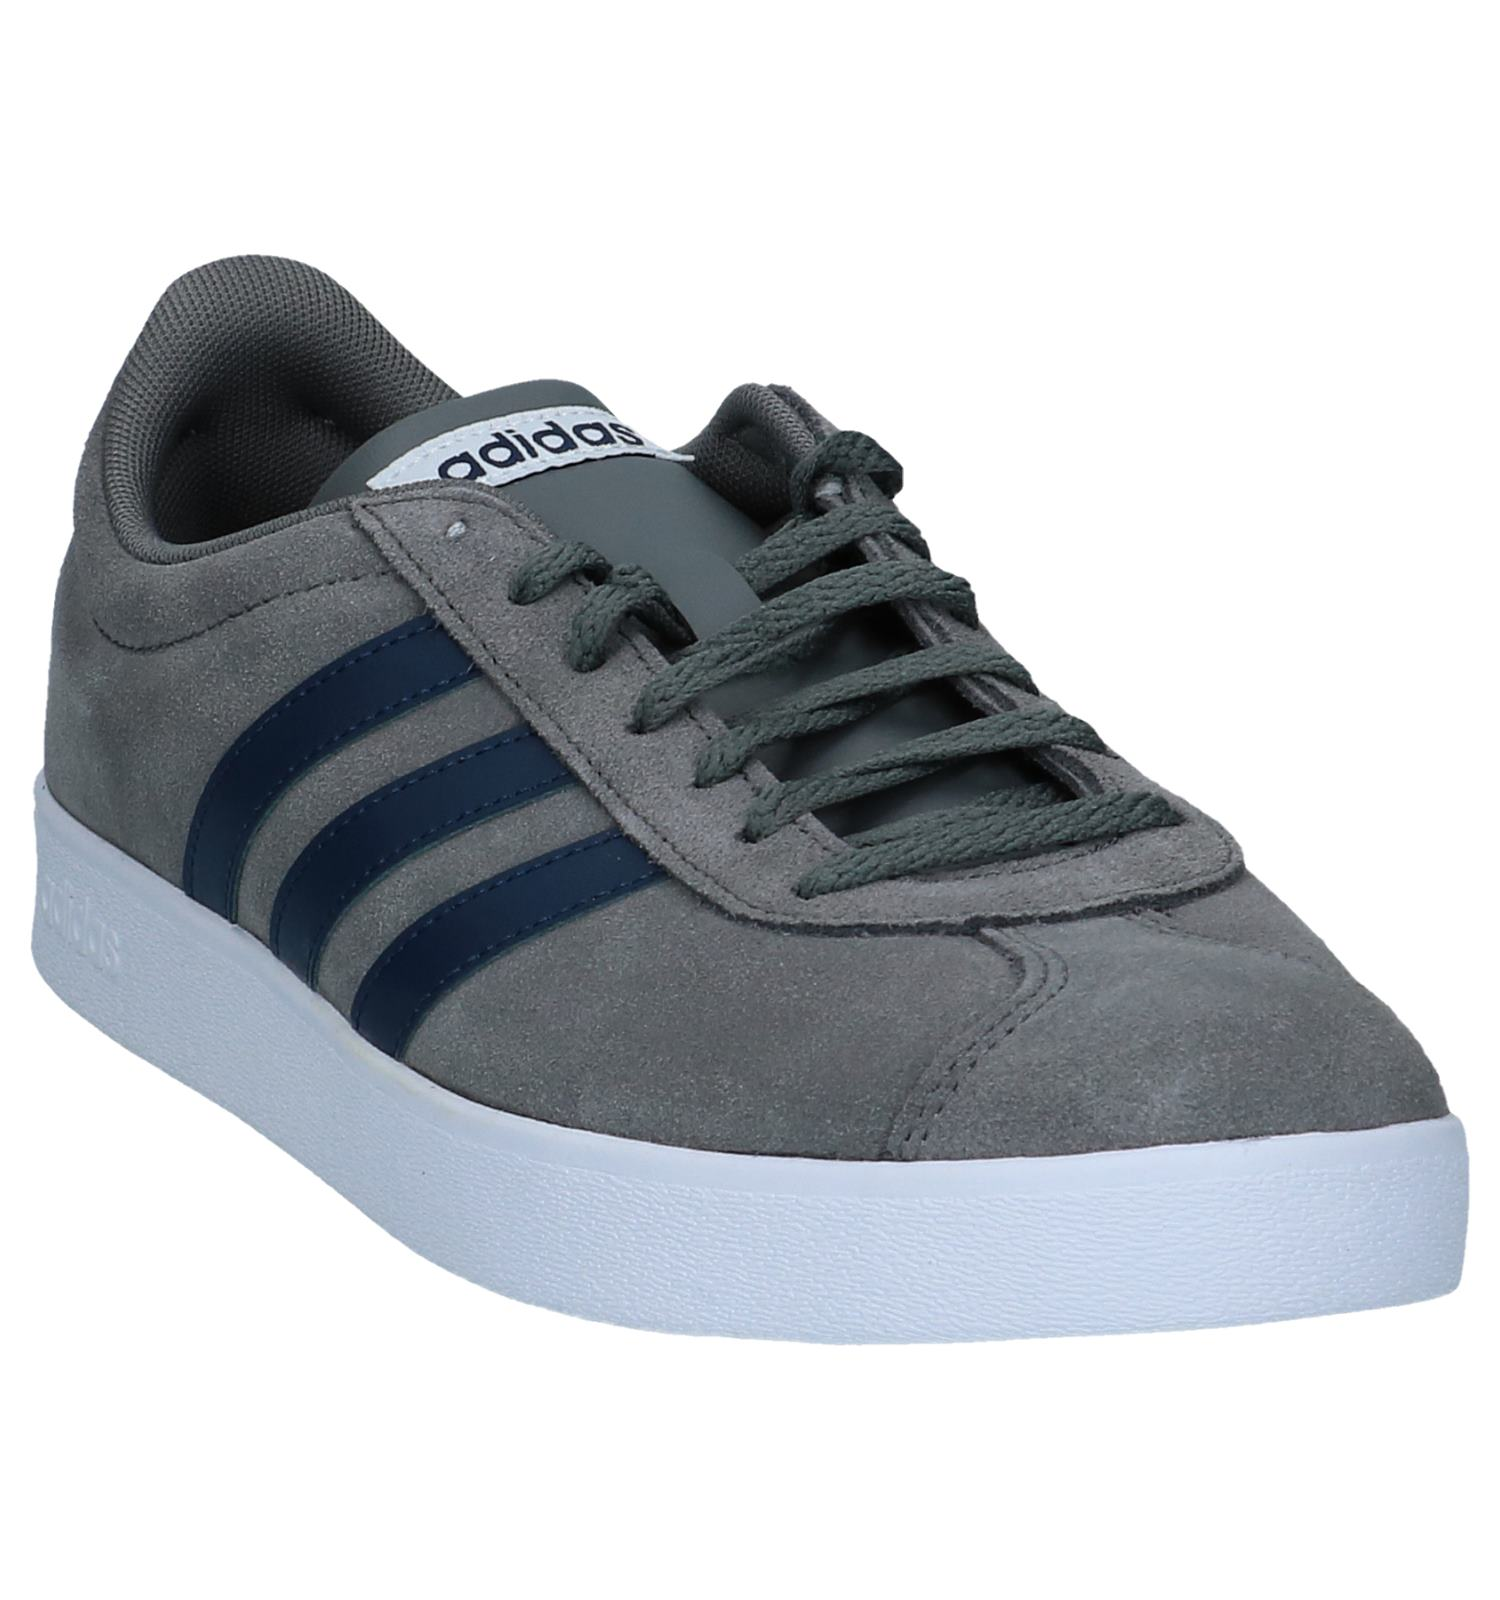 Sneakers Vl Grijze Court 0 2 Adidas W9EYDH2I